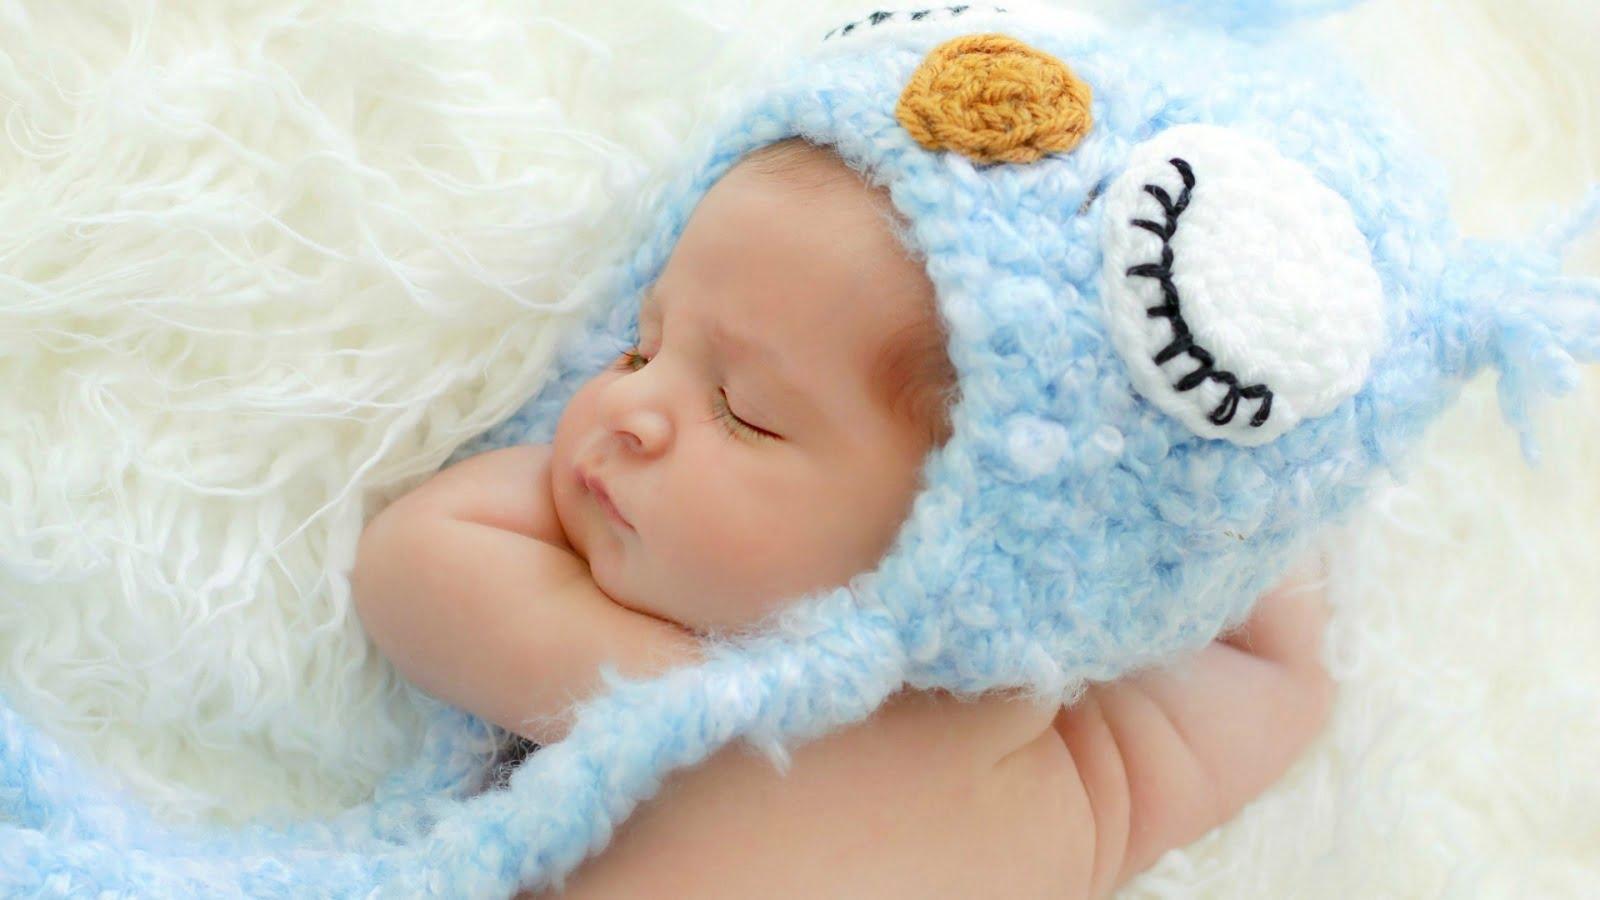 Copil doarme Foto: www.bhmpics.com